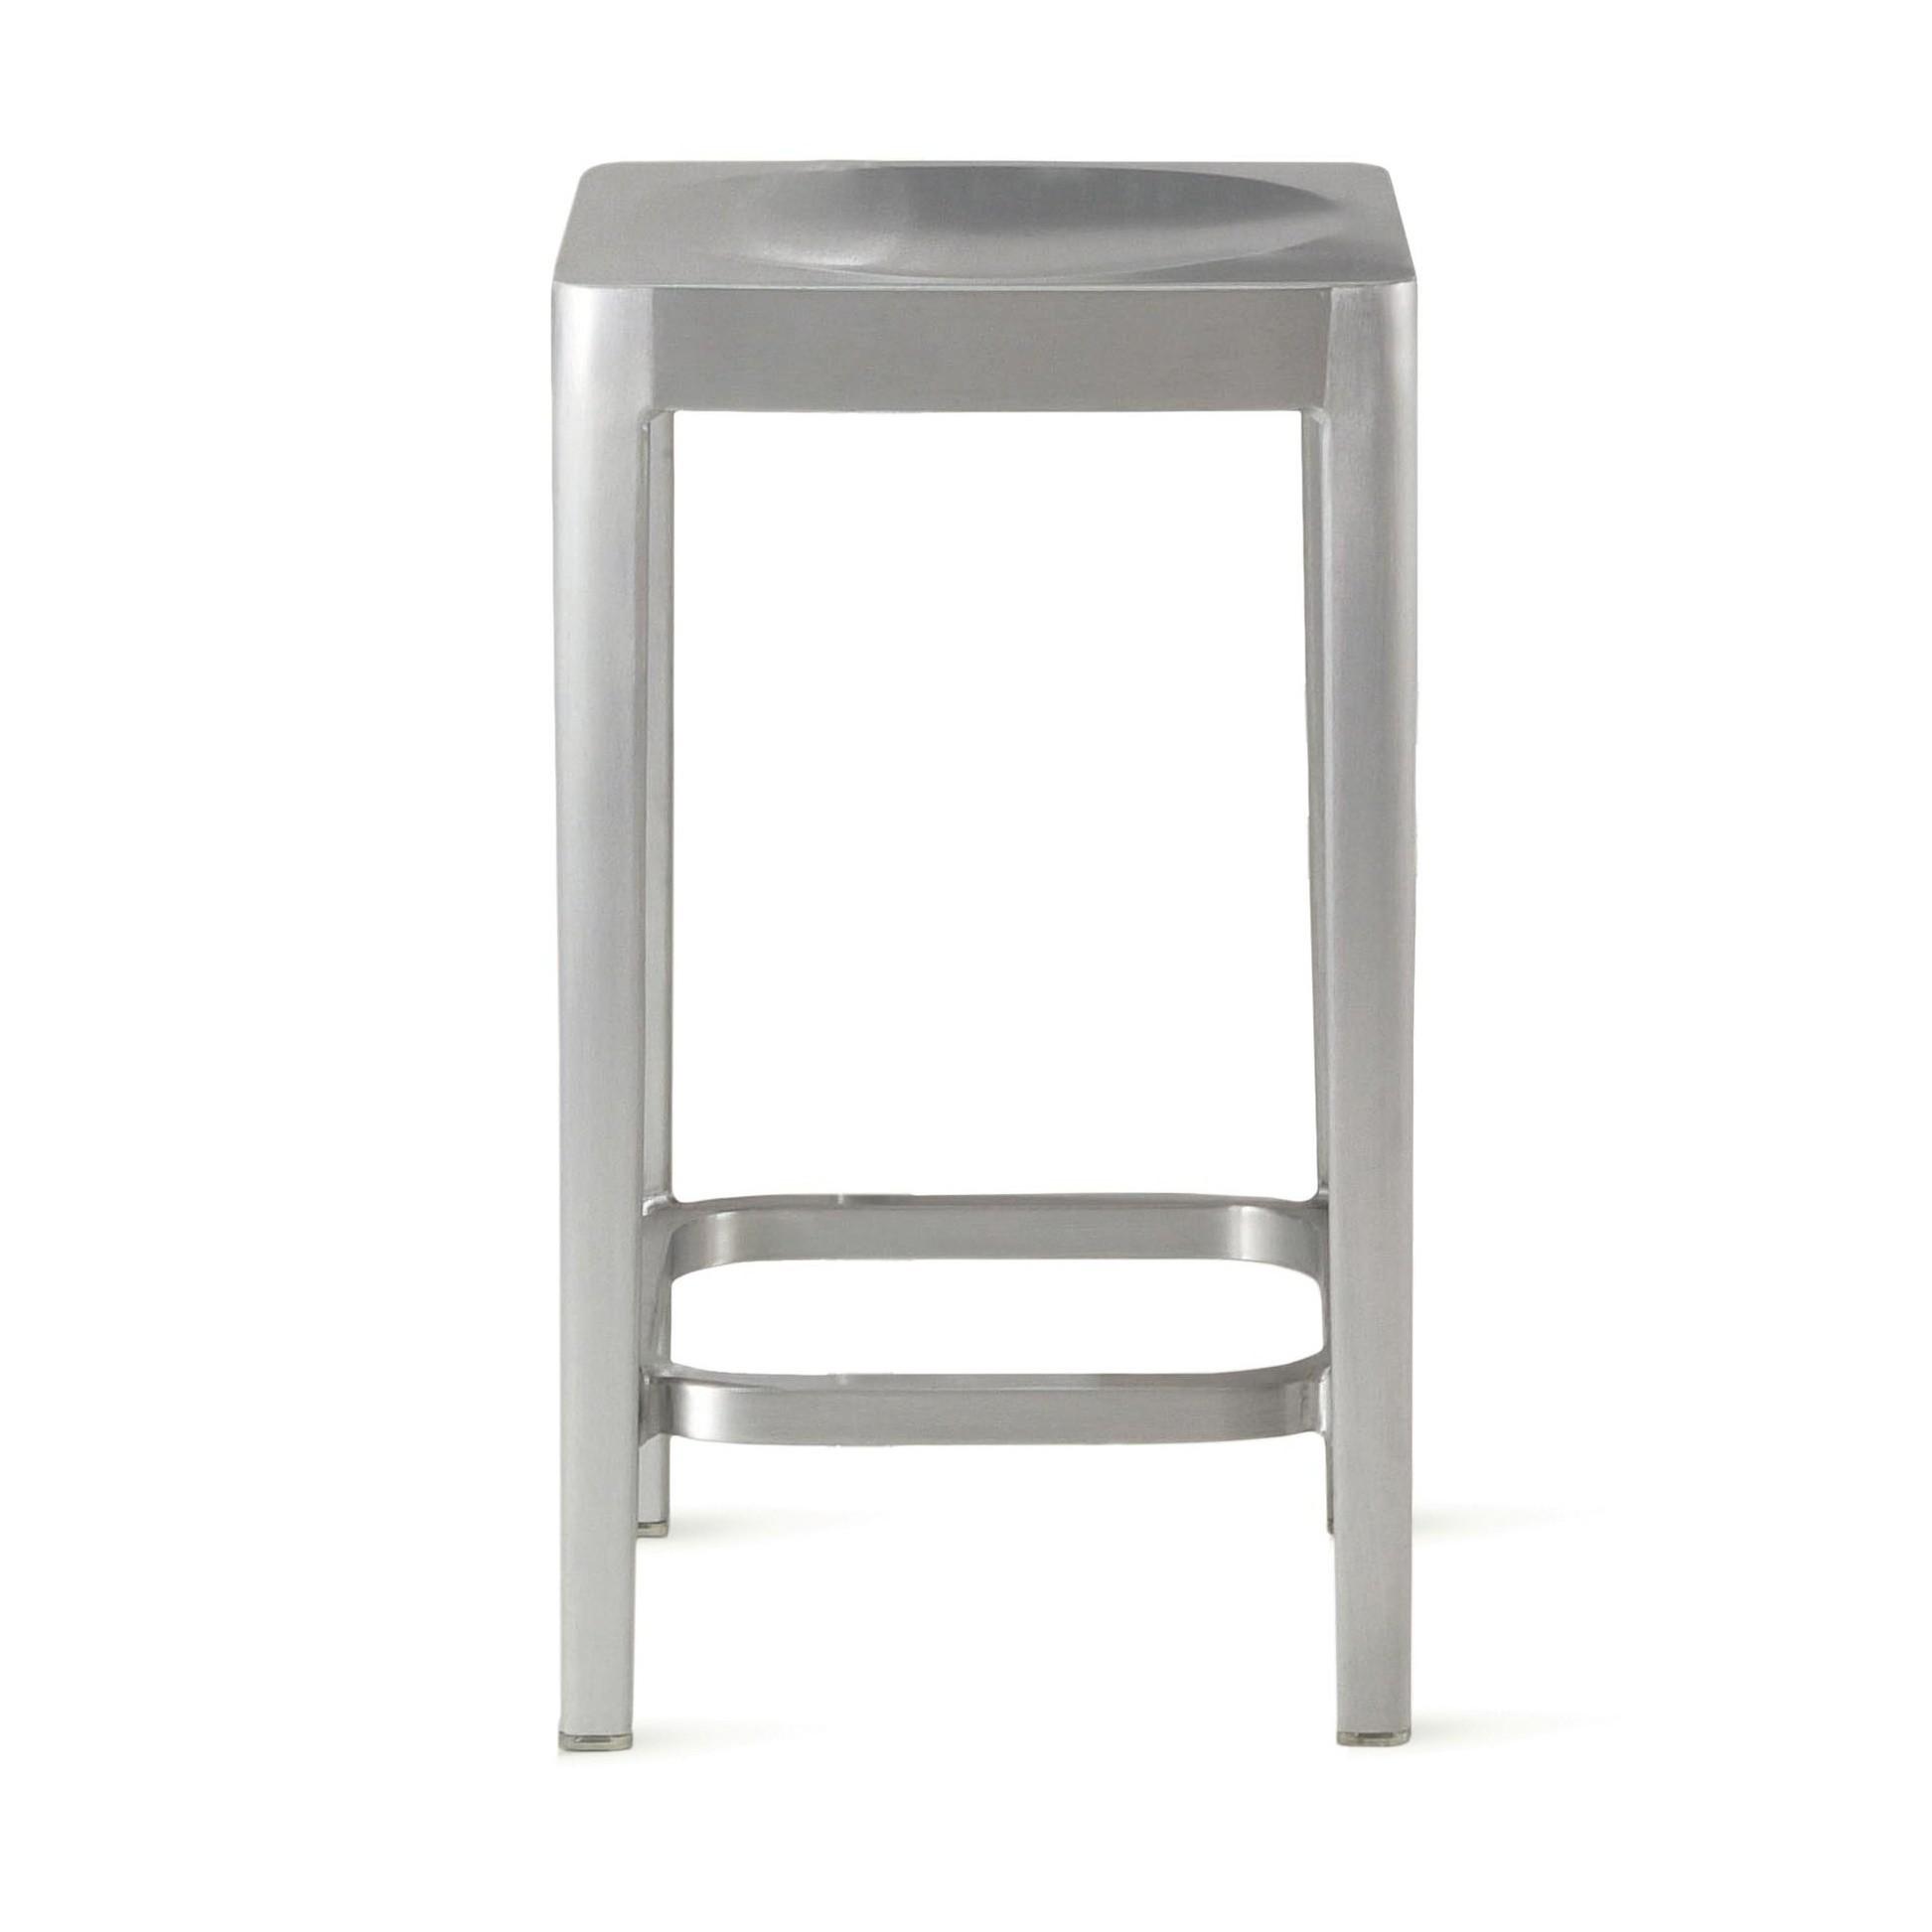 emeco emeco counter stool tabouret de bar ambientedirect. Black Bedroom Furniture Sets. Home Design Ideas